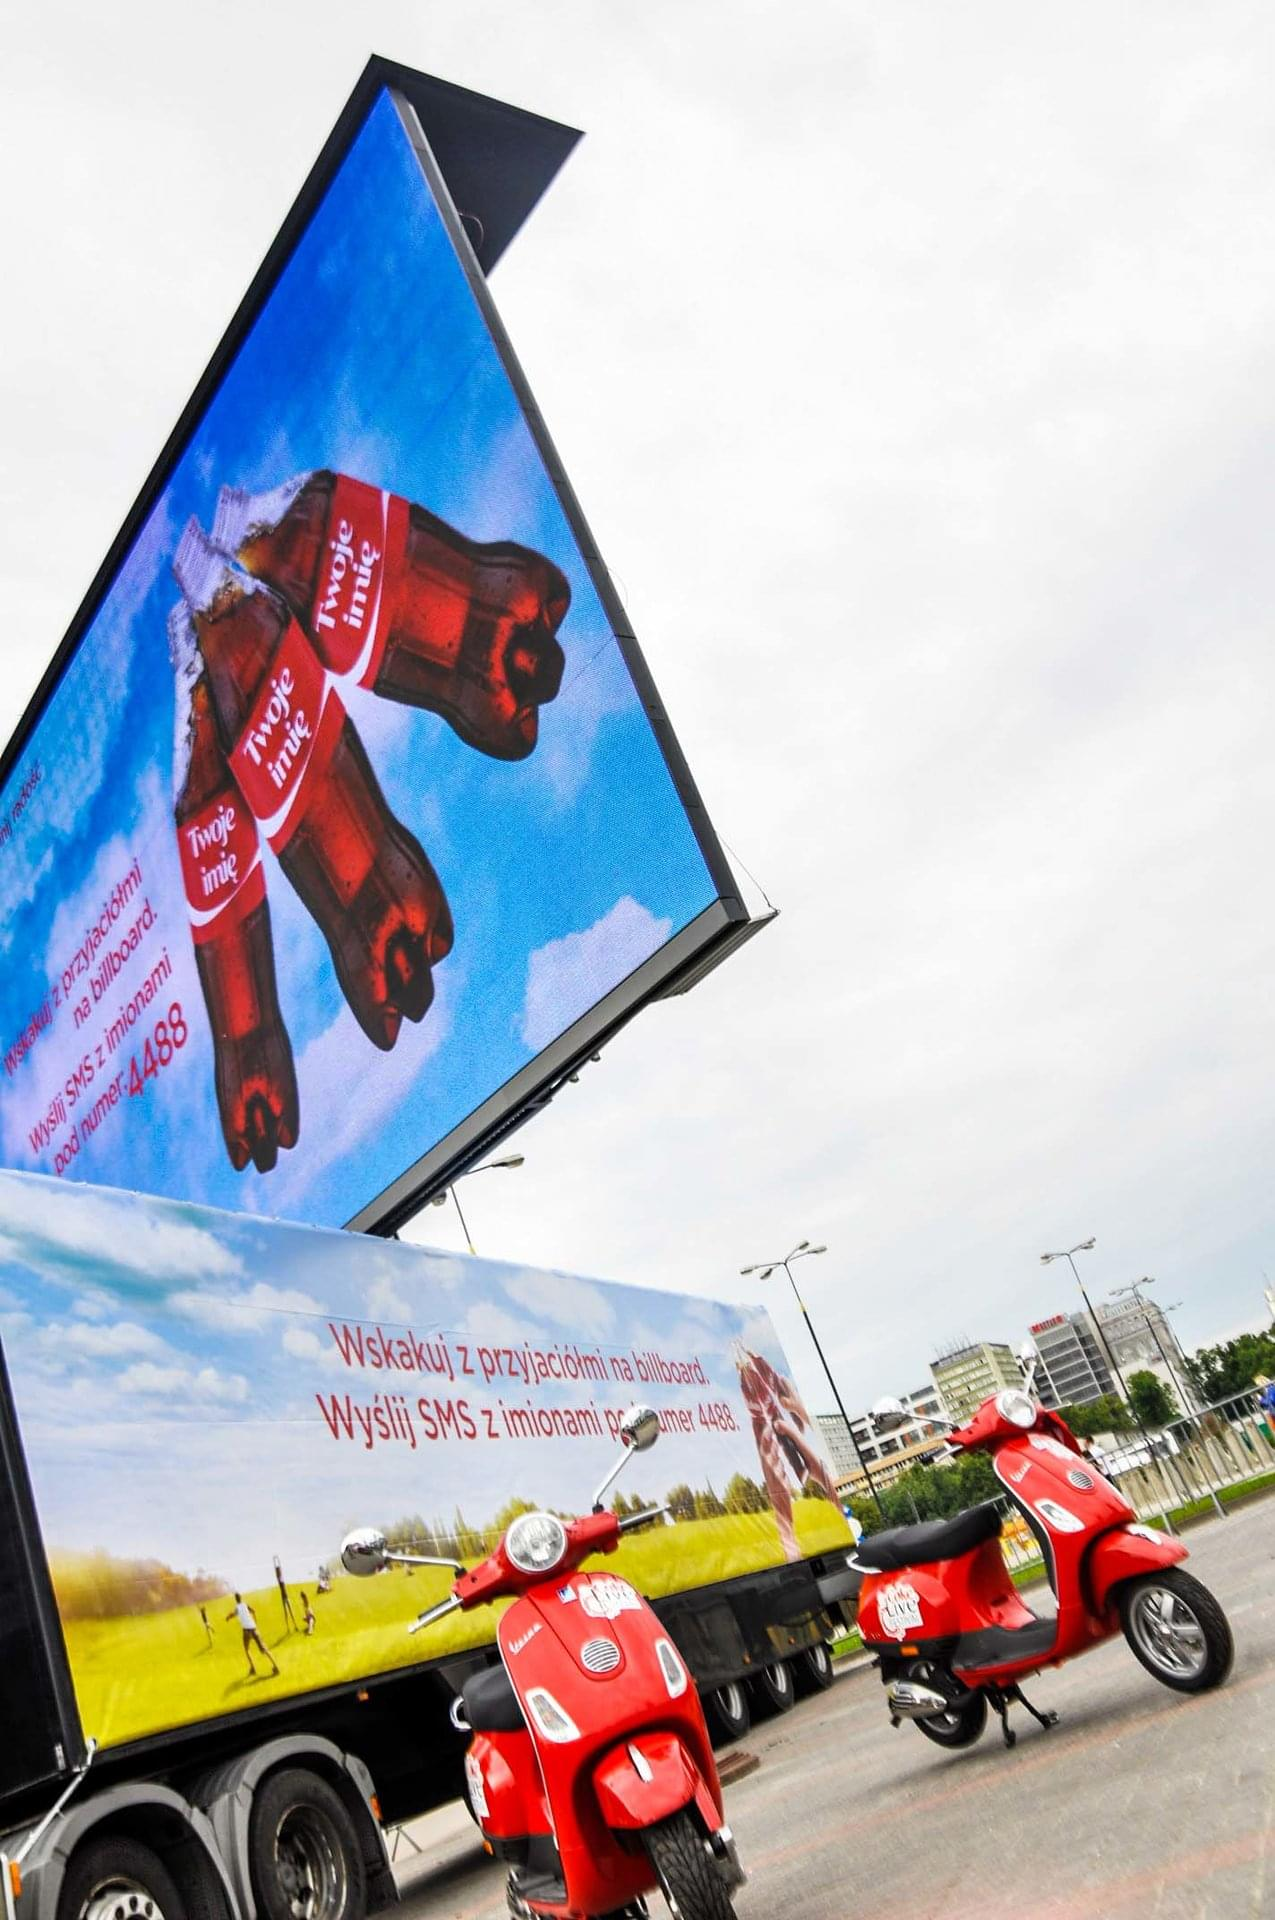 Warsaw Coca Cola campaign 2